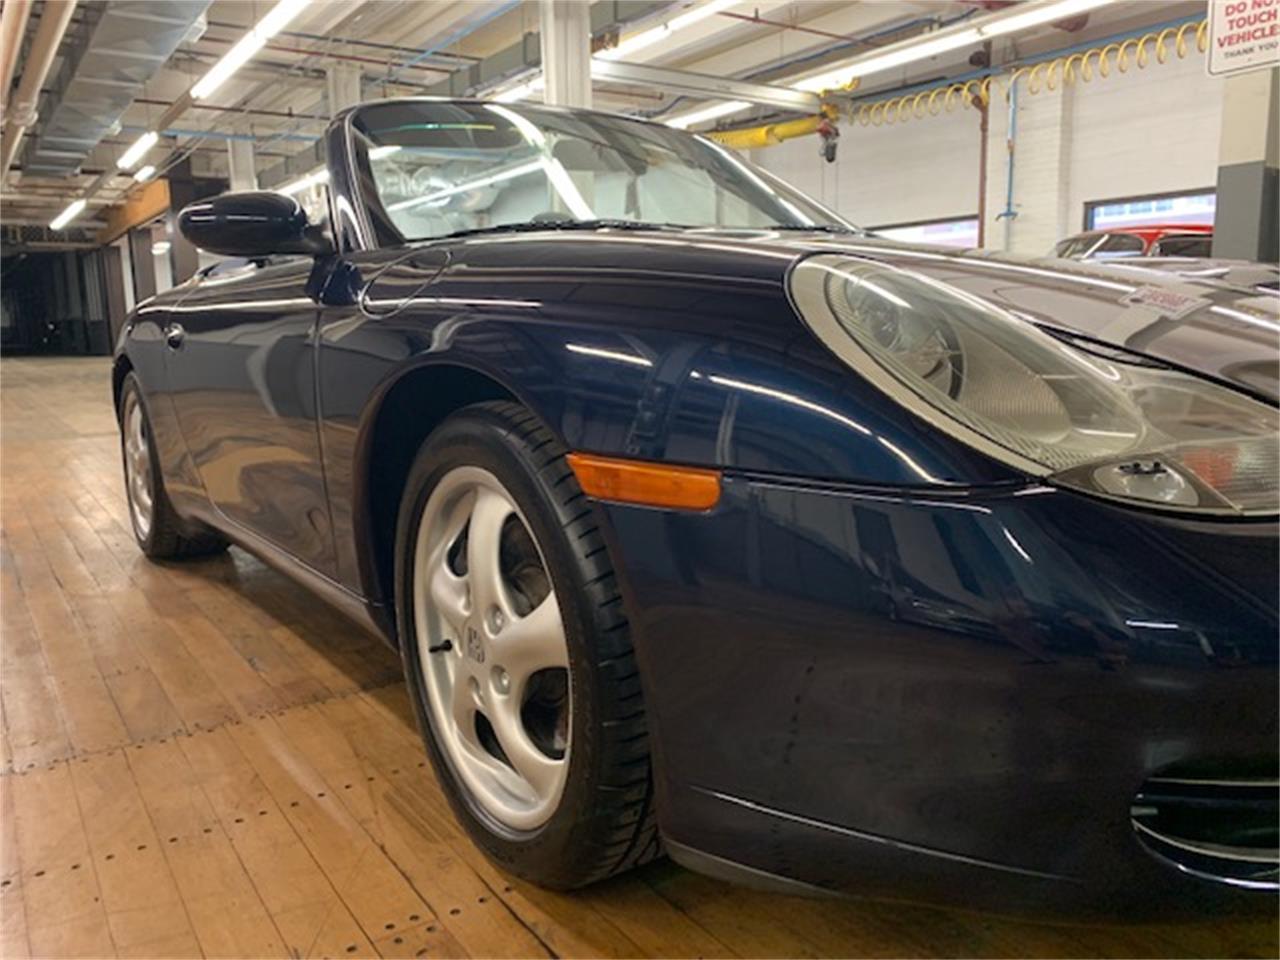 2000 Porsche 911 Carrera (CC-1239271) for sale in Bridgeport, Connecticut